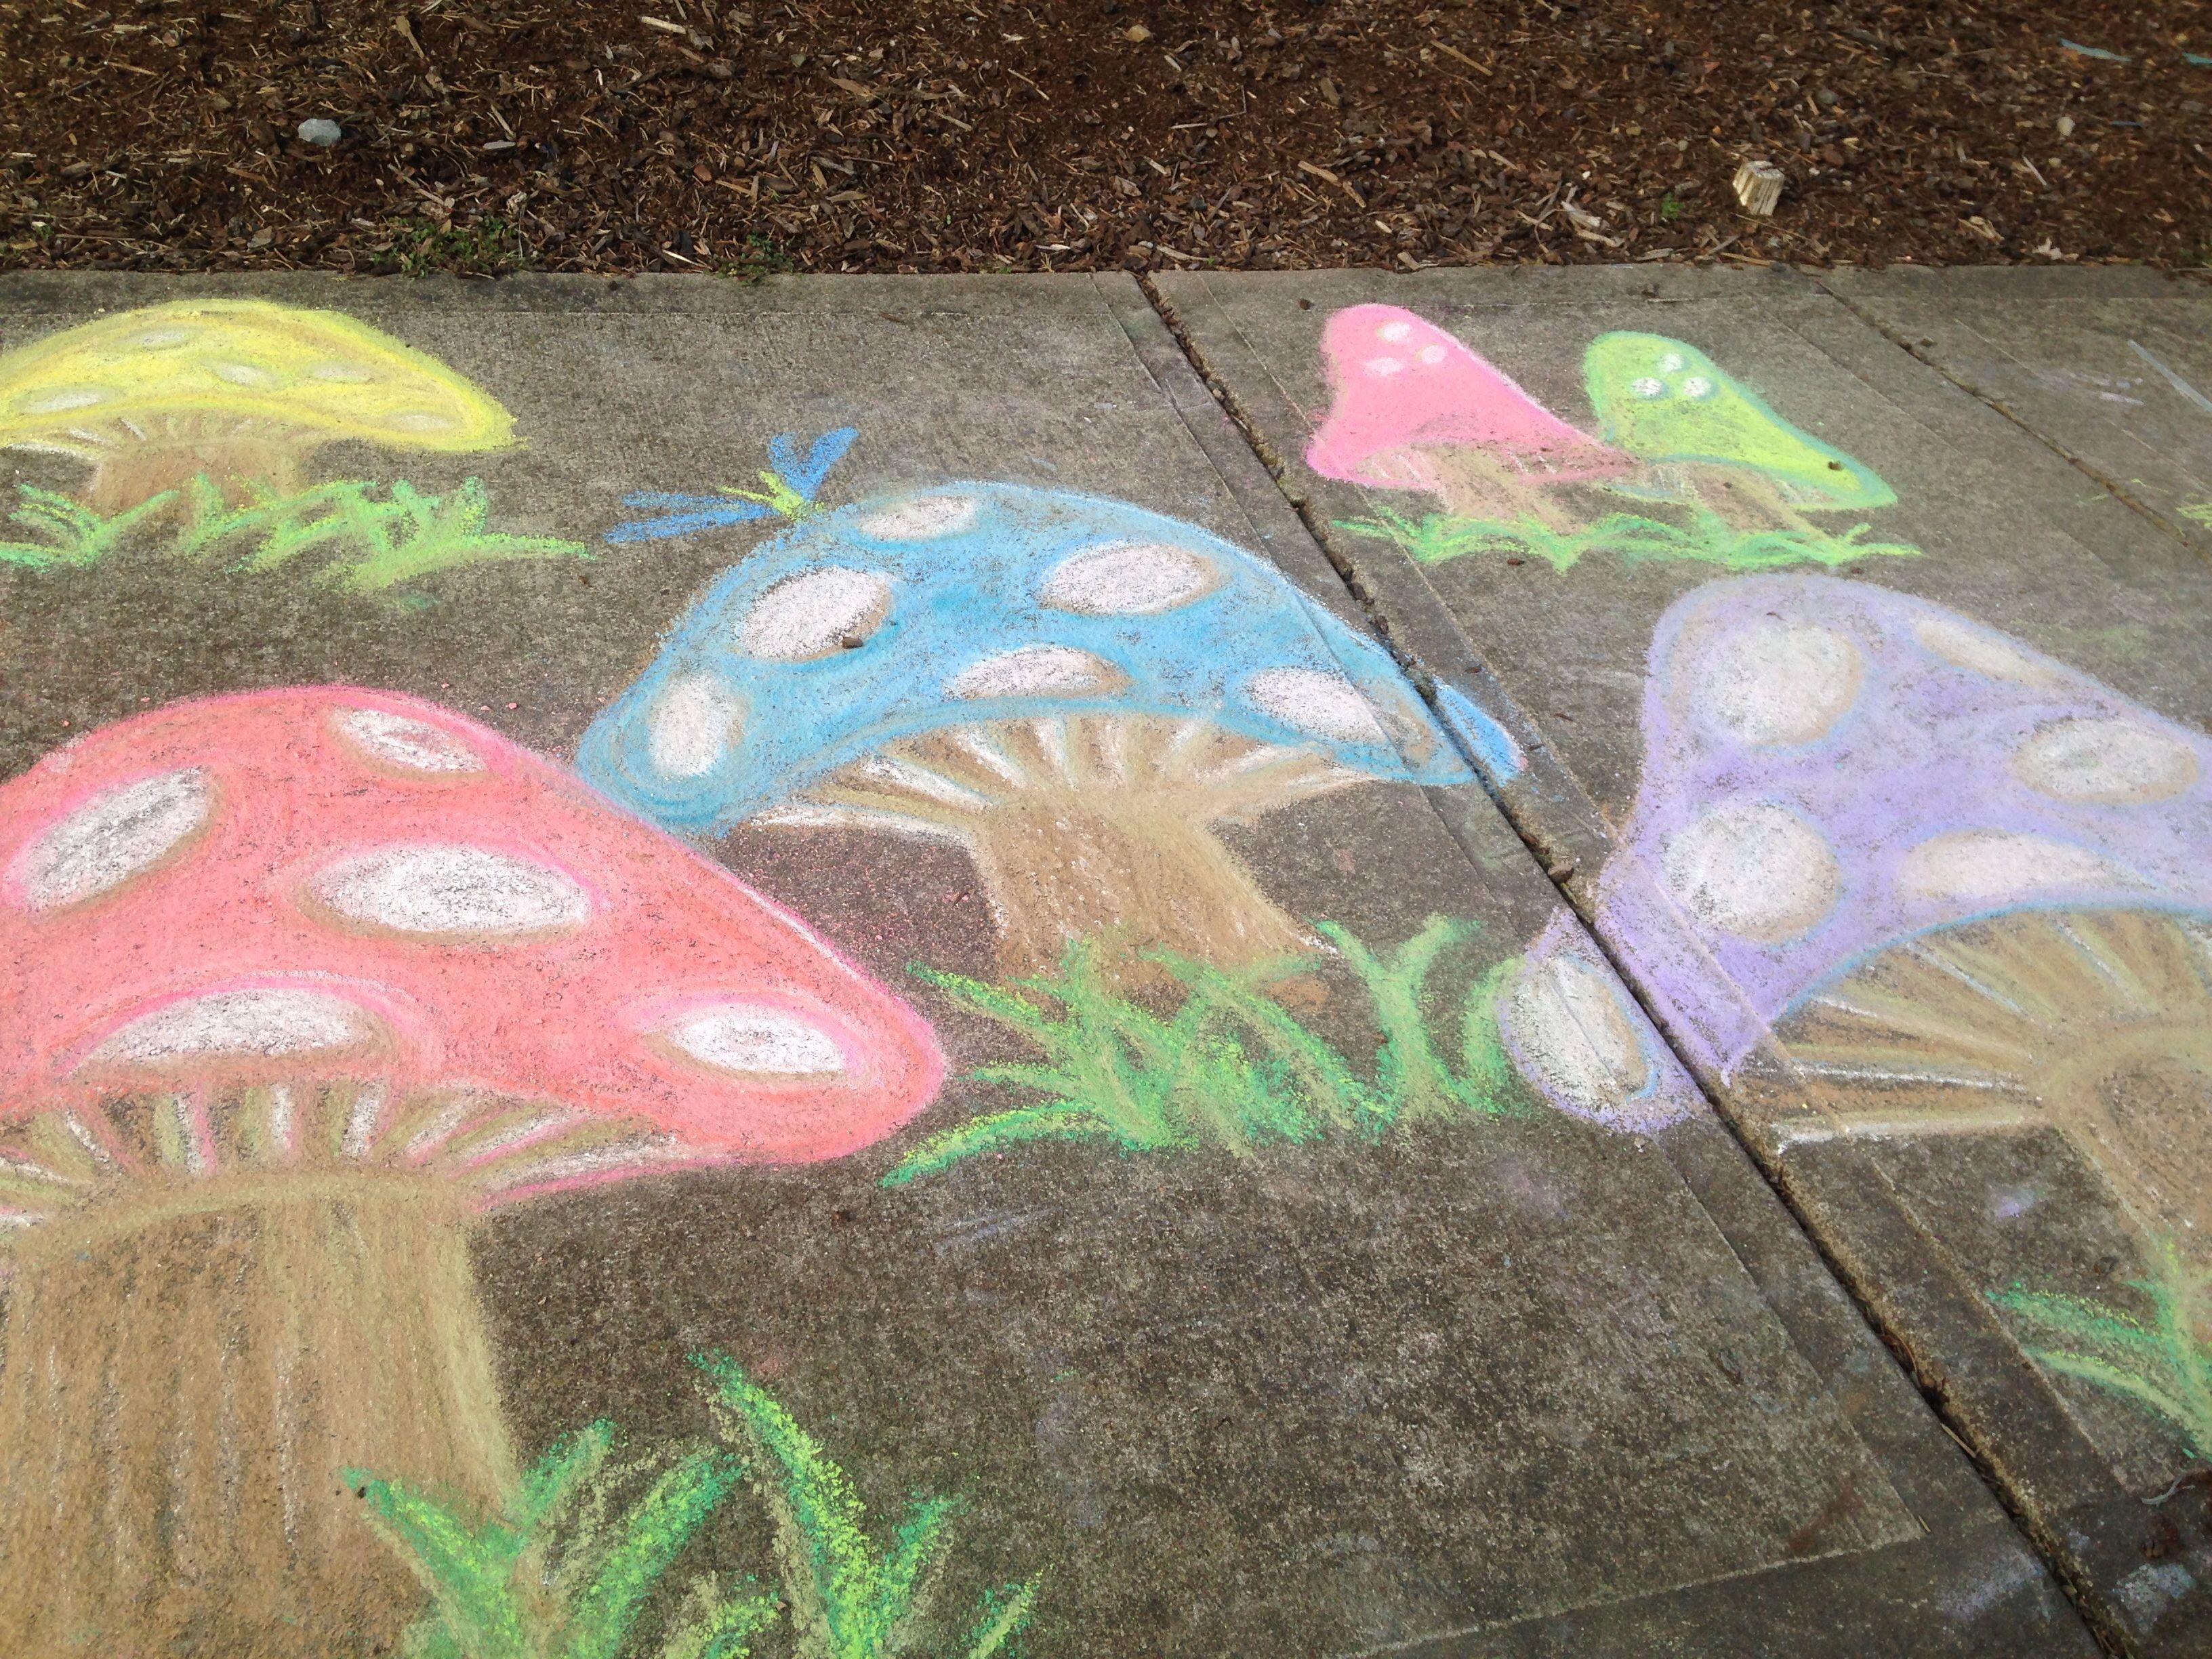 Sidewalk Chalk Fun -- As the Sun Sets on Summer | My Chalk Photos ...